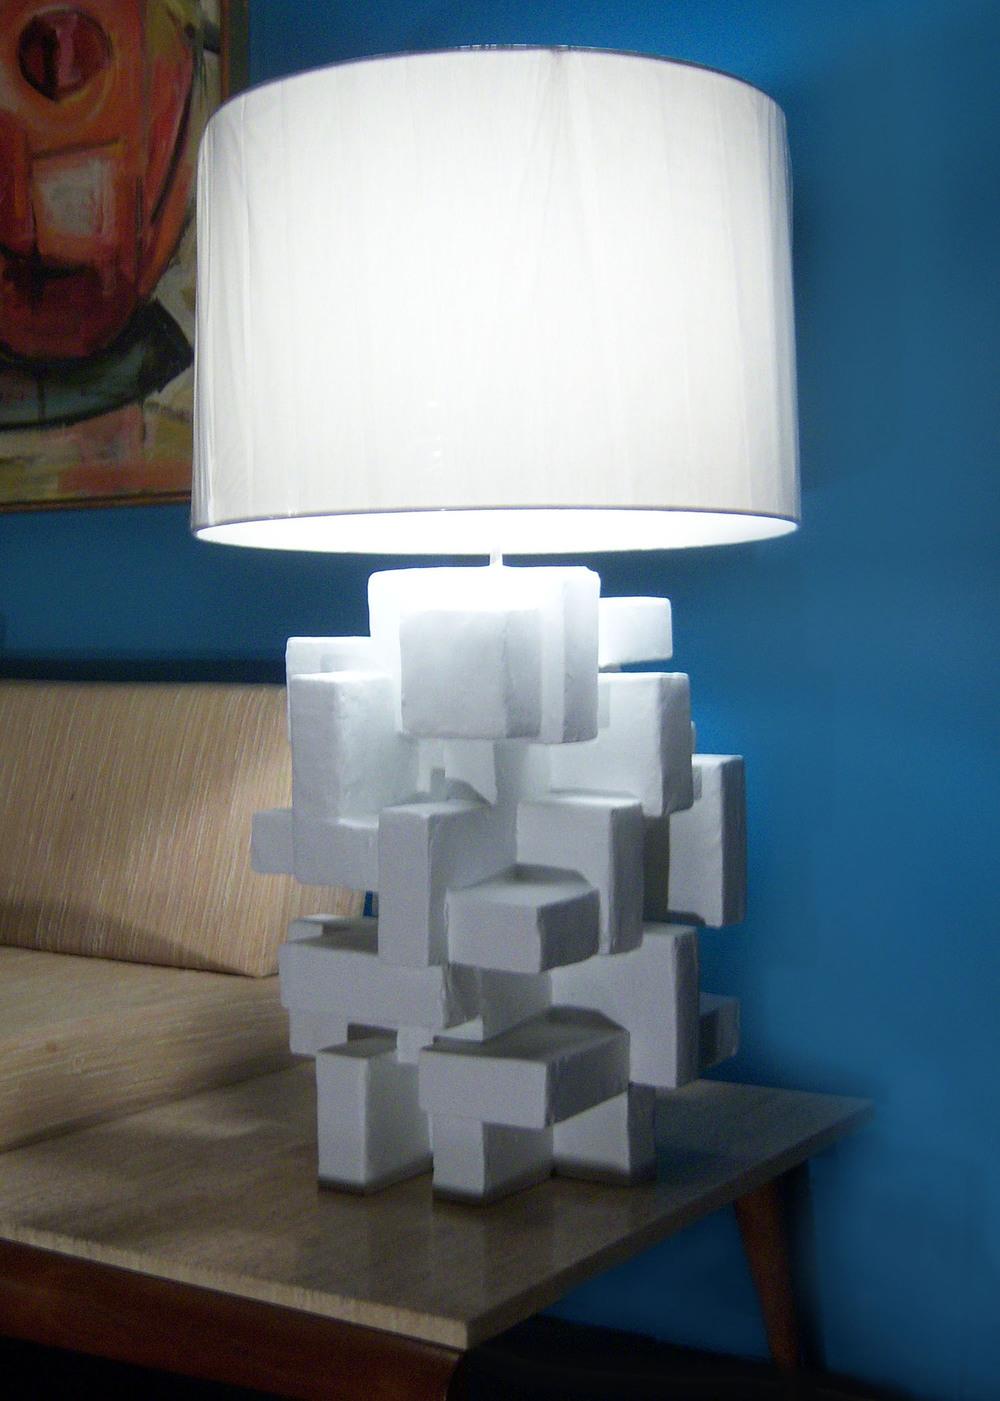 "ABITARE TABLE LAMP III, Mixed Media, 22"", 16"" x 16"", 2012"